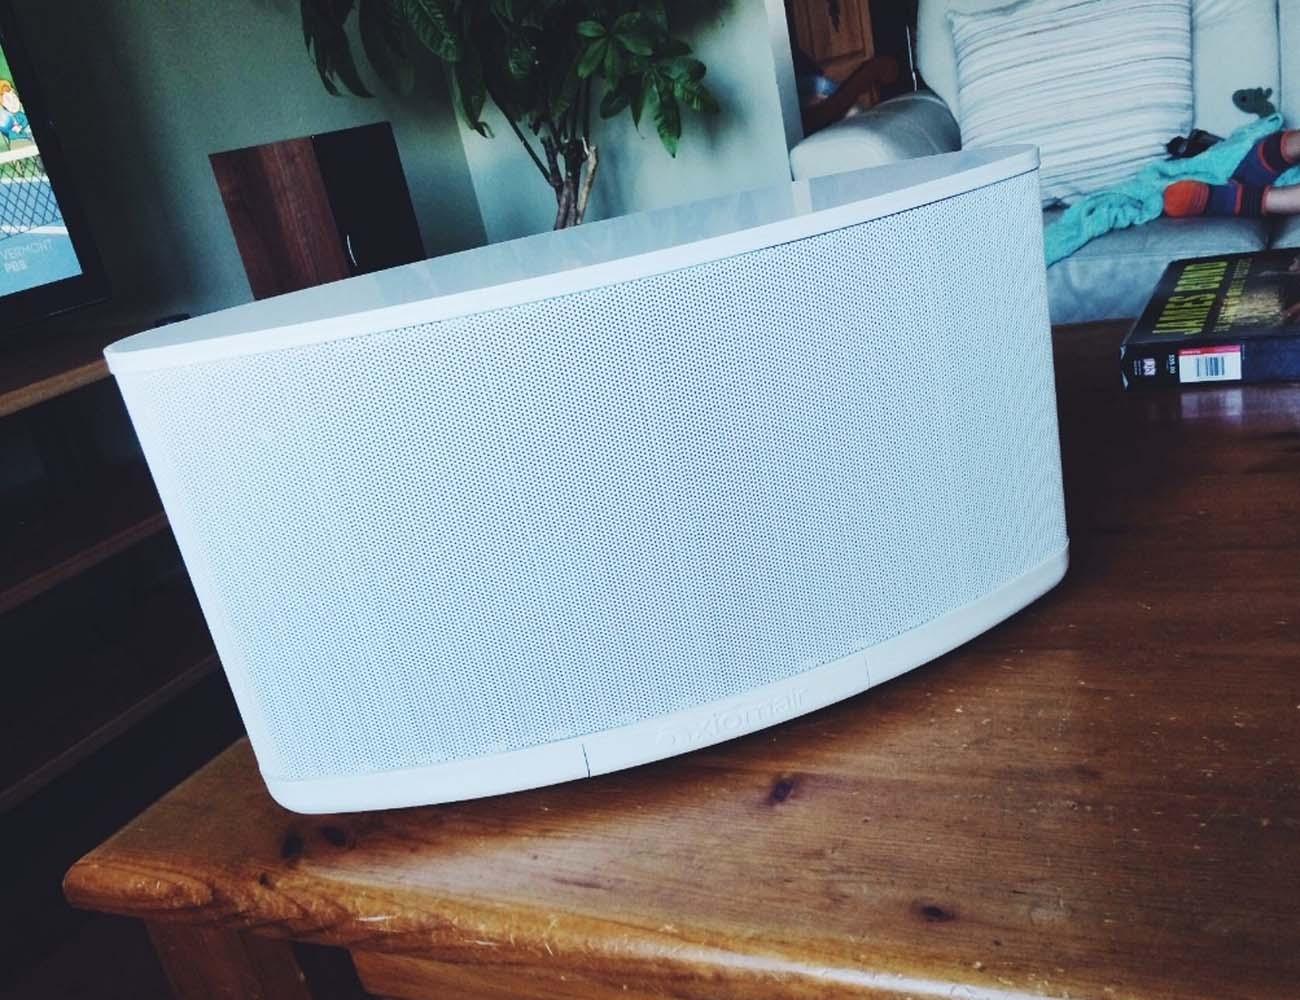 AxiomAir – Powerful Wireless Wi-Fi Speaker